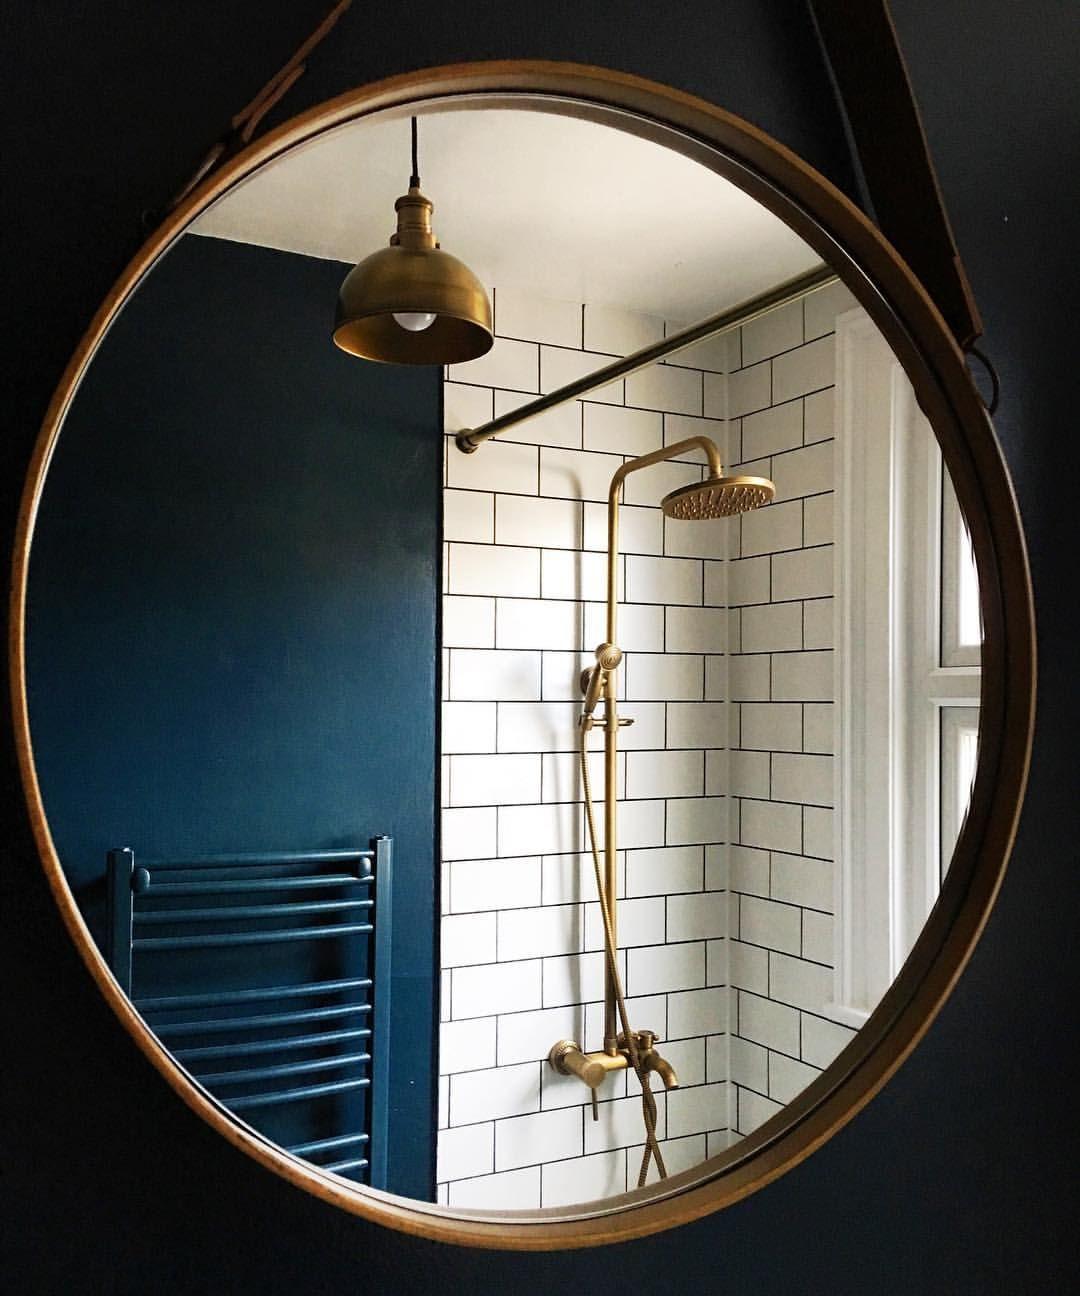 Bathroom Farrow And Ball Hague Blue Walls With Copper Pipes In Shower Room Bohemian Bathroom Metro Tiles Bathroom Bathroom Styling